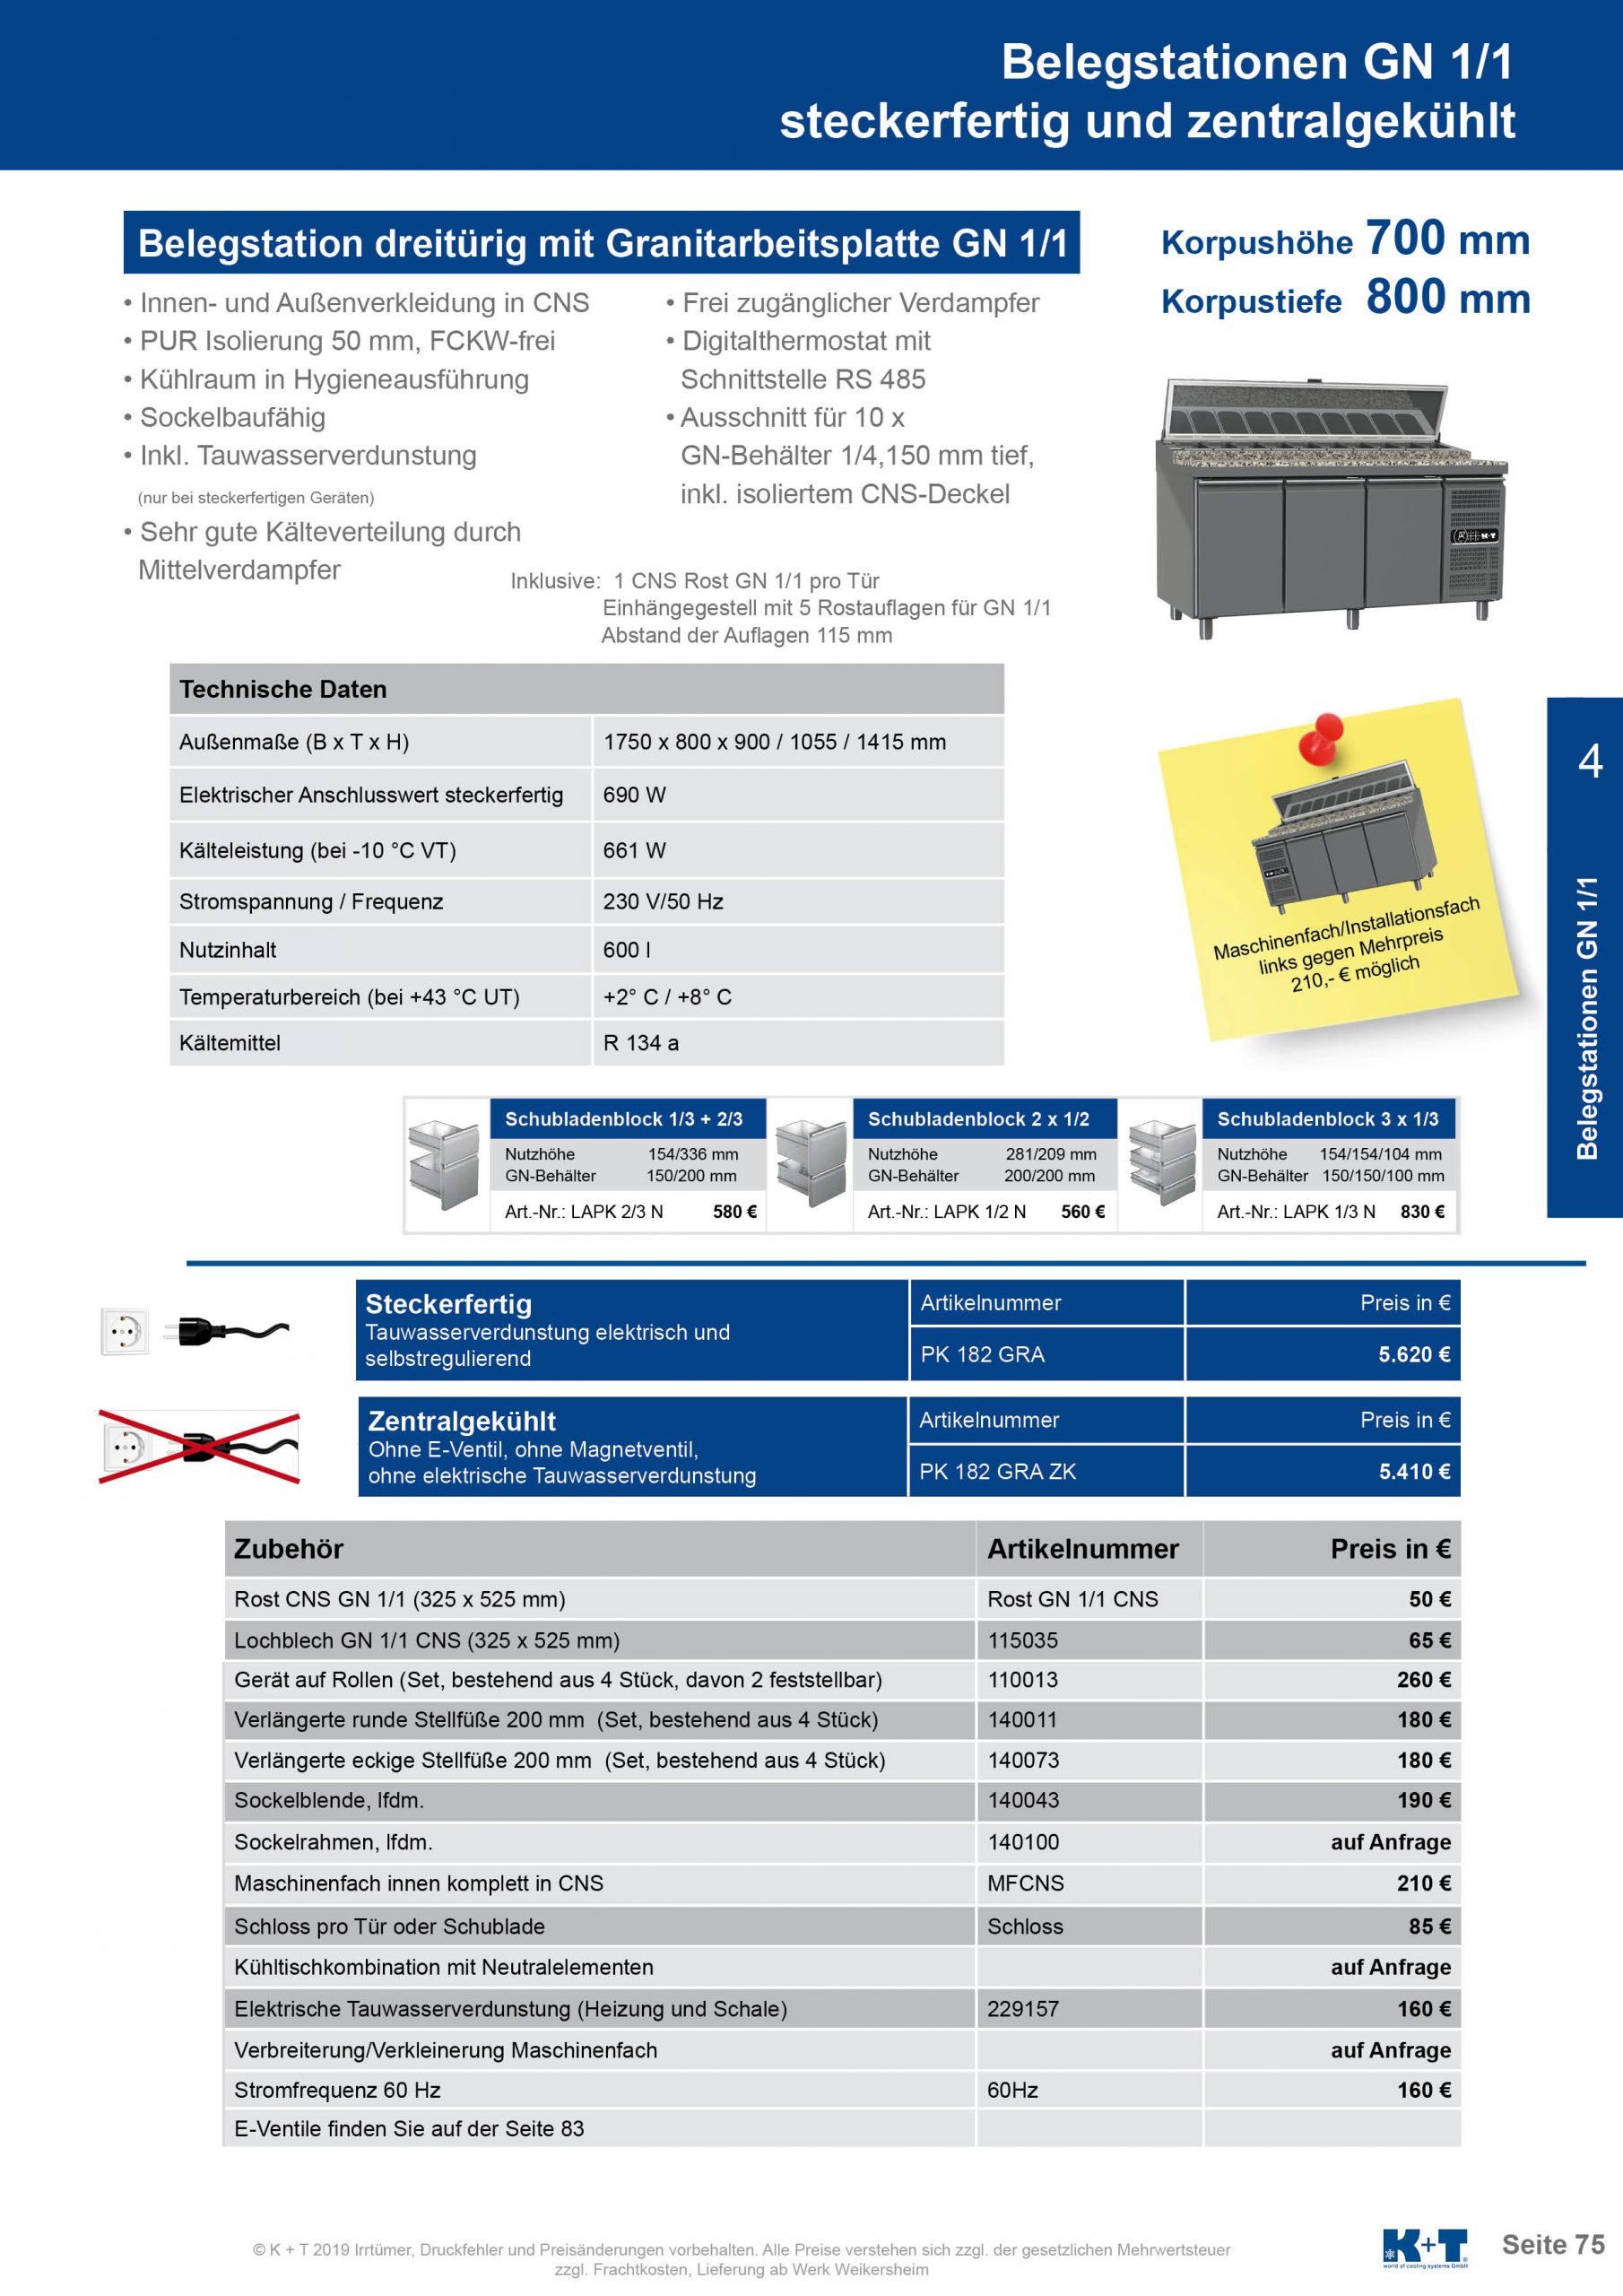 Belegstation GN 1_1 Korpushöhe 700, Tiefe 800 zentralgekühlt 4